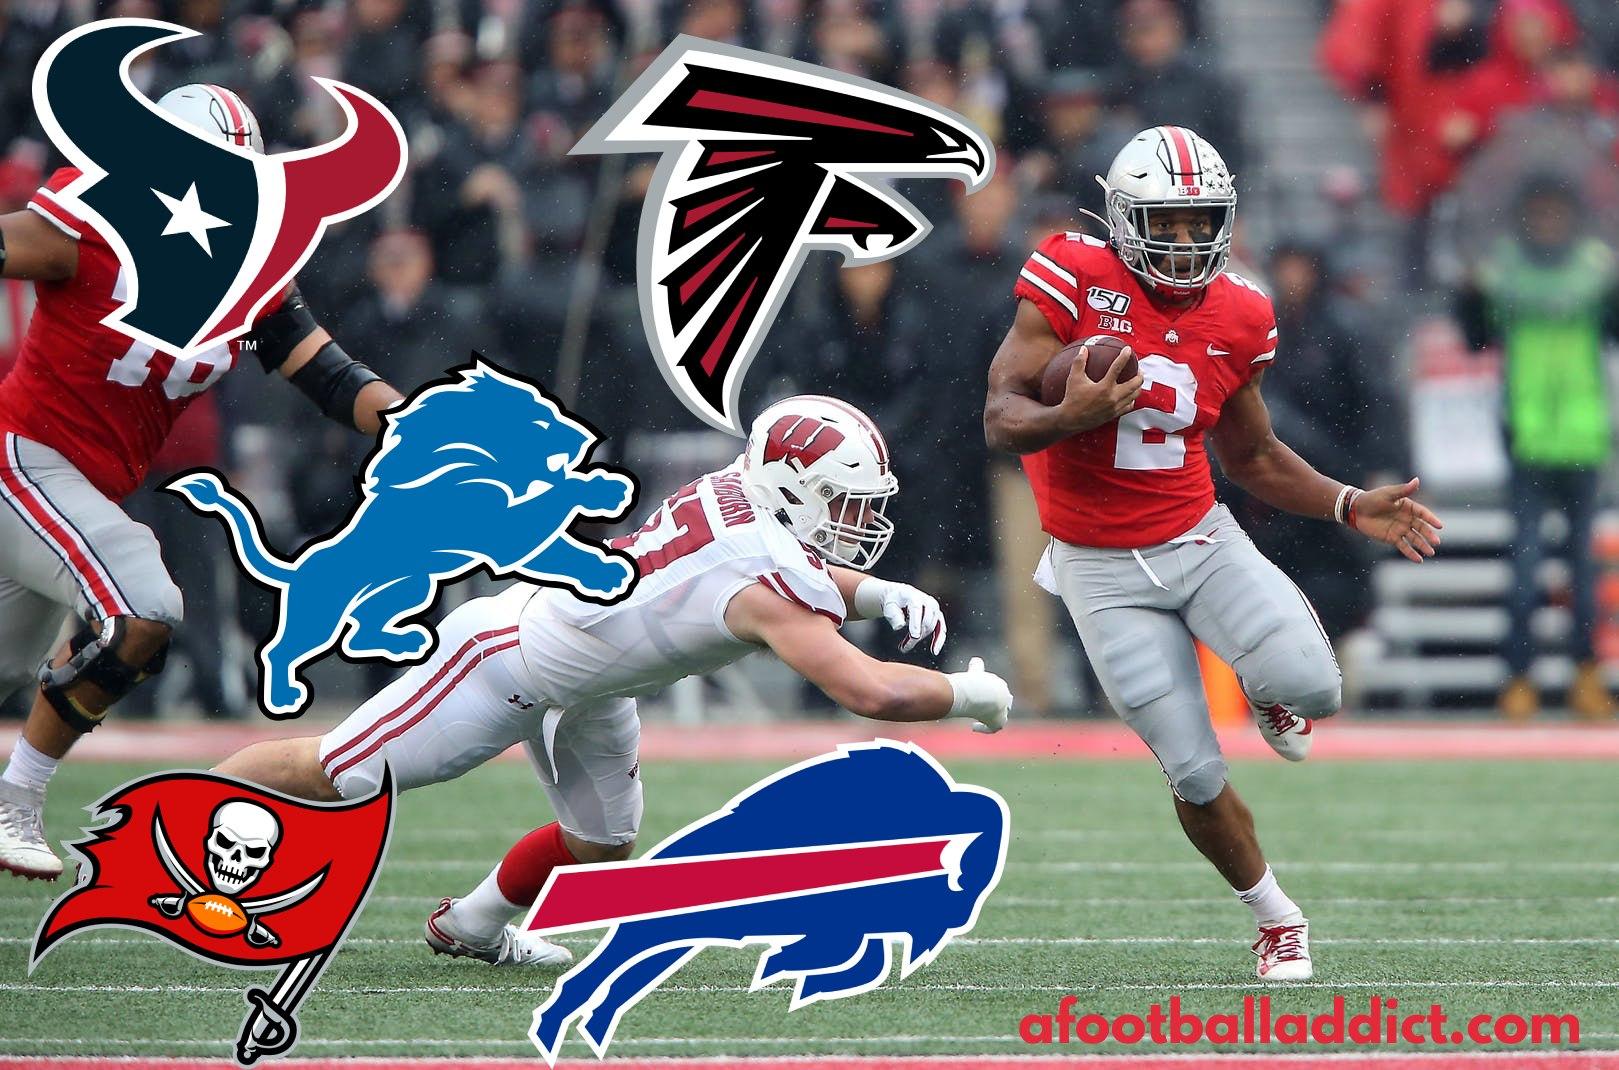 2020 NFL Draft Profile: J.K. Dobbins